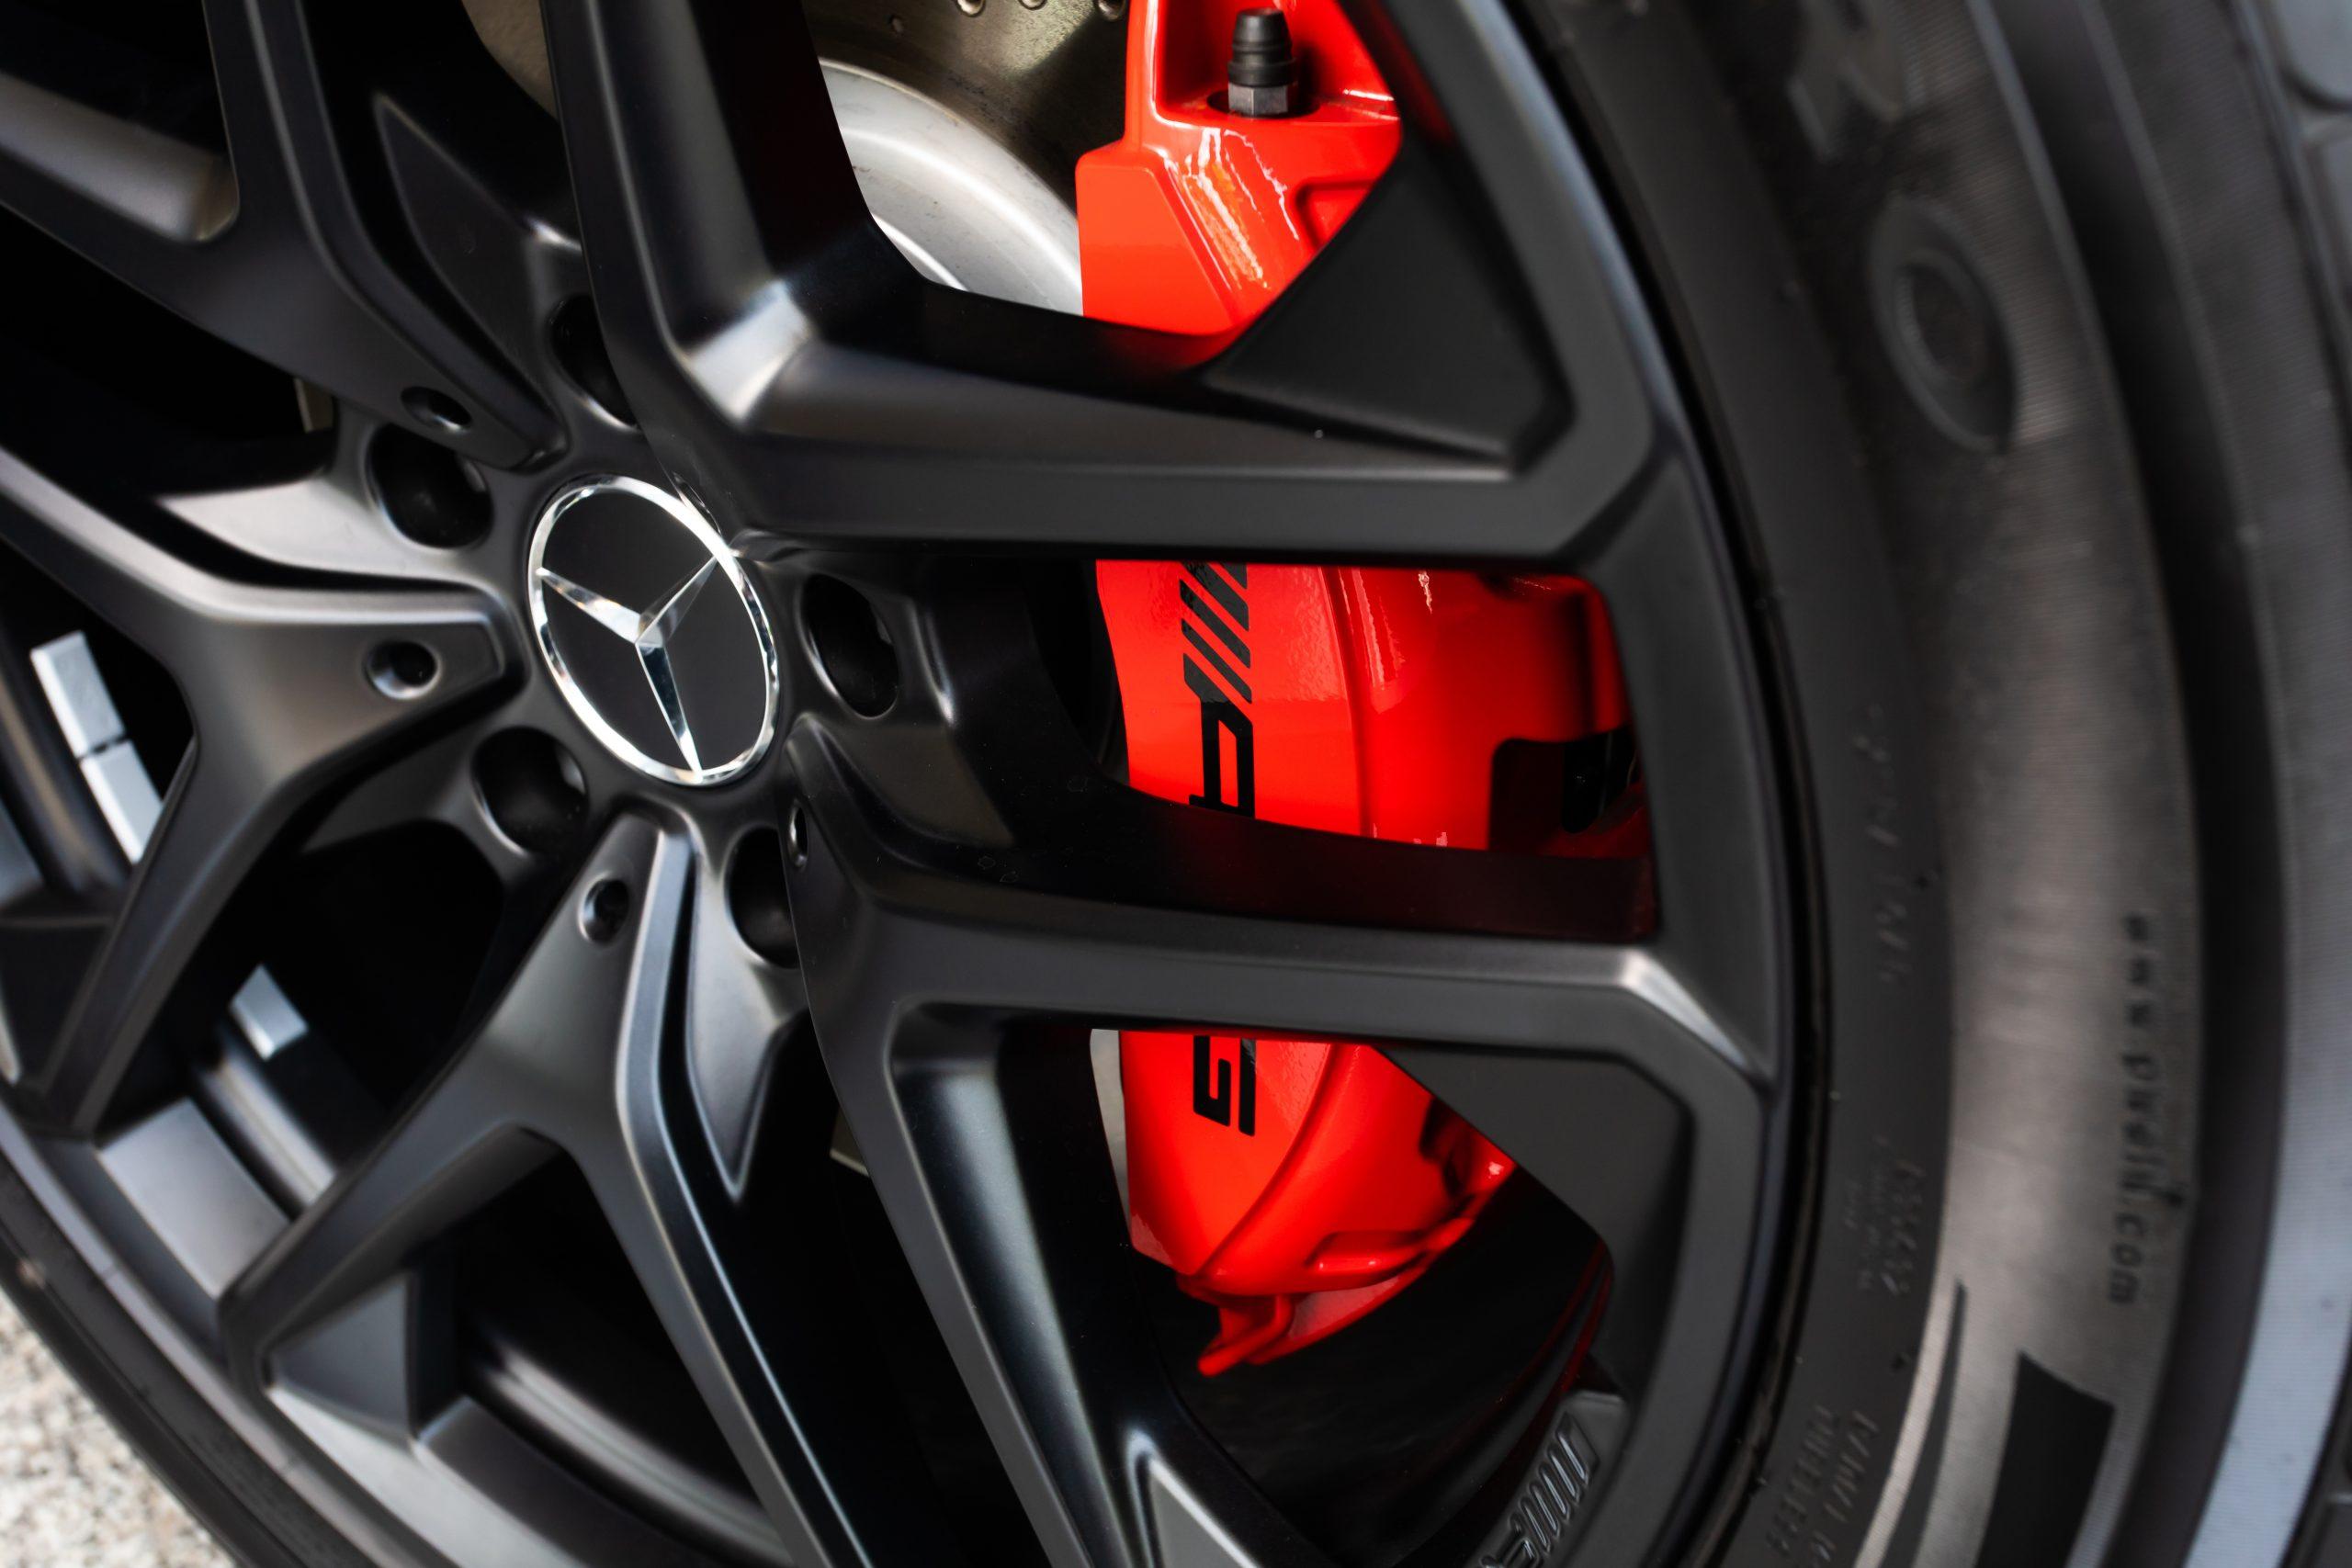 Bangkok, Thailand - 2012 June 11 : Closeup Mercedes AMG Wheel and with break disc in Bangkok Benz showroom.